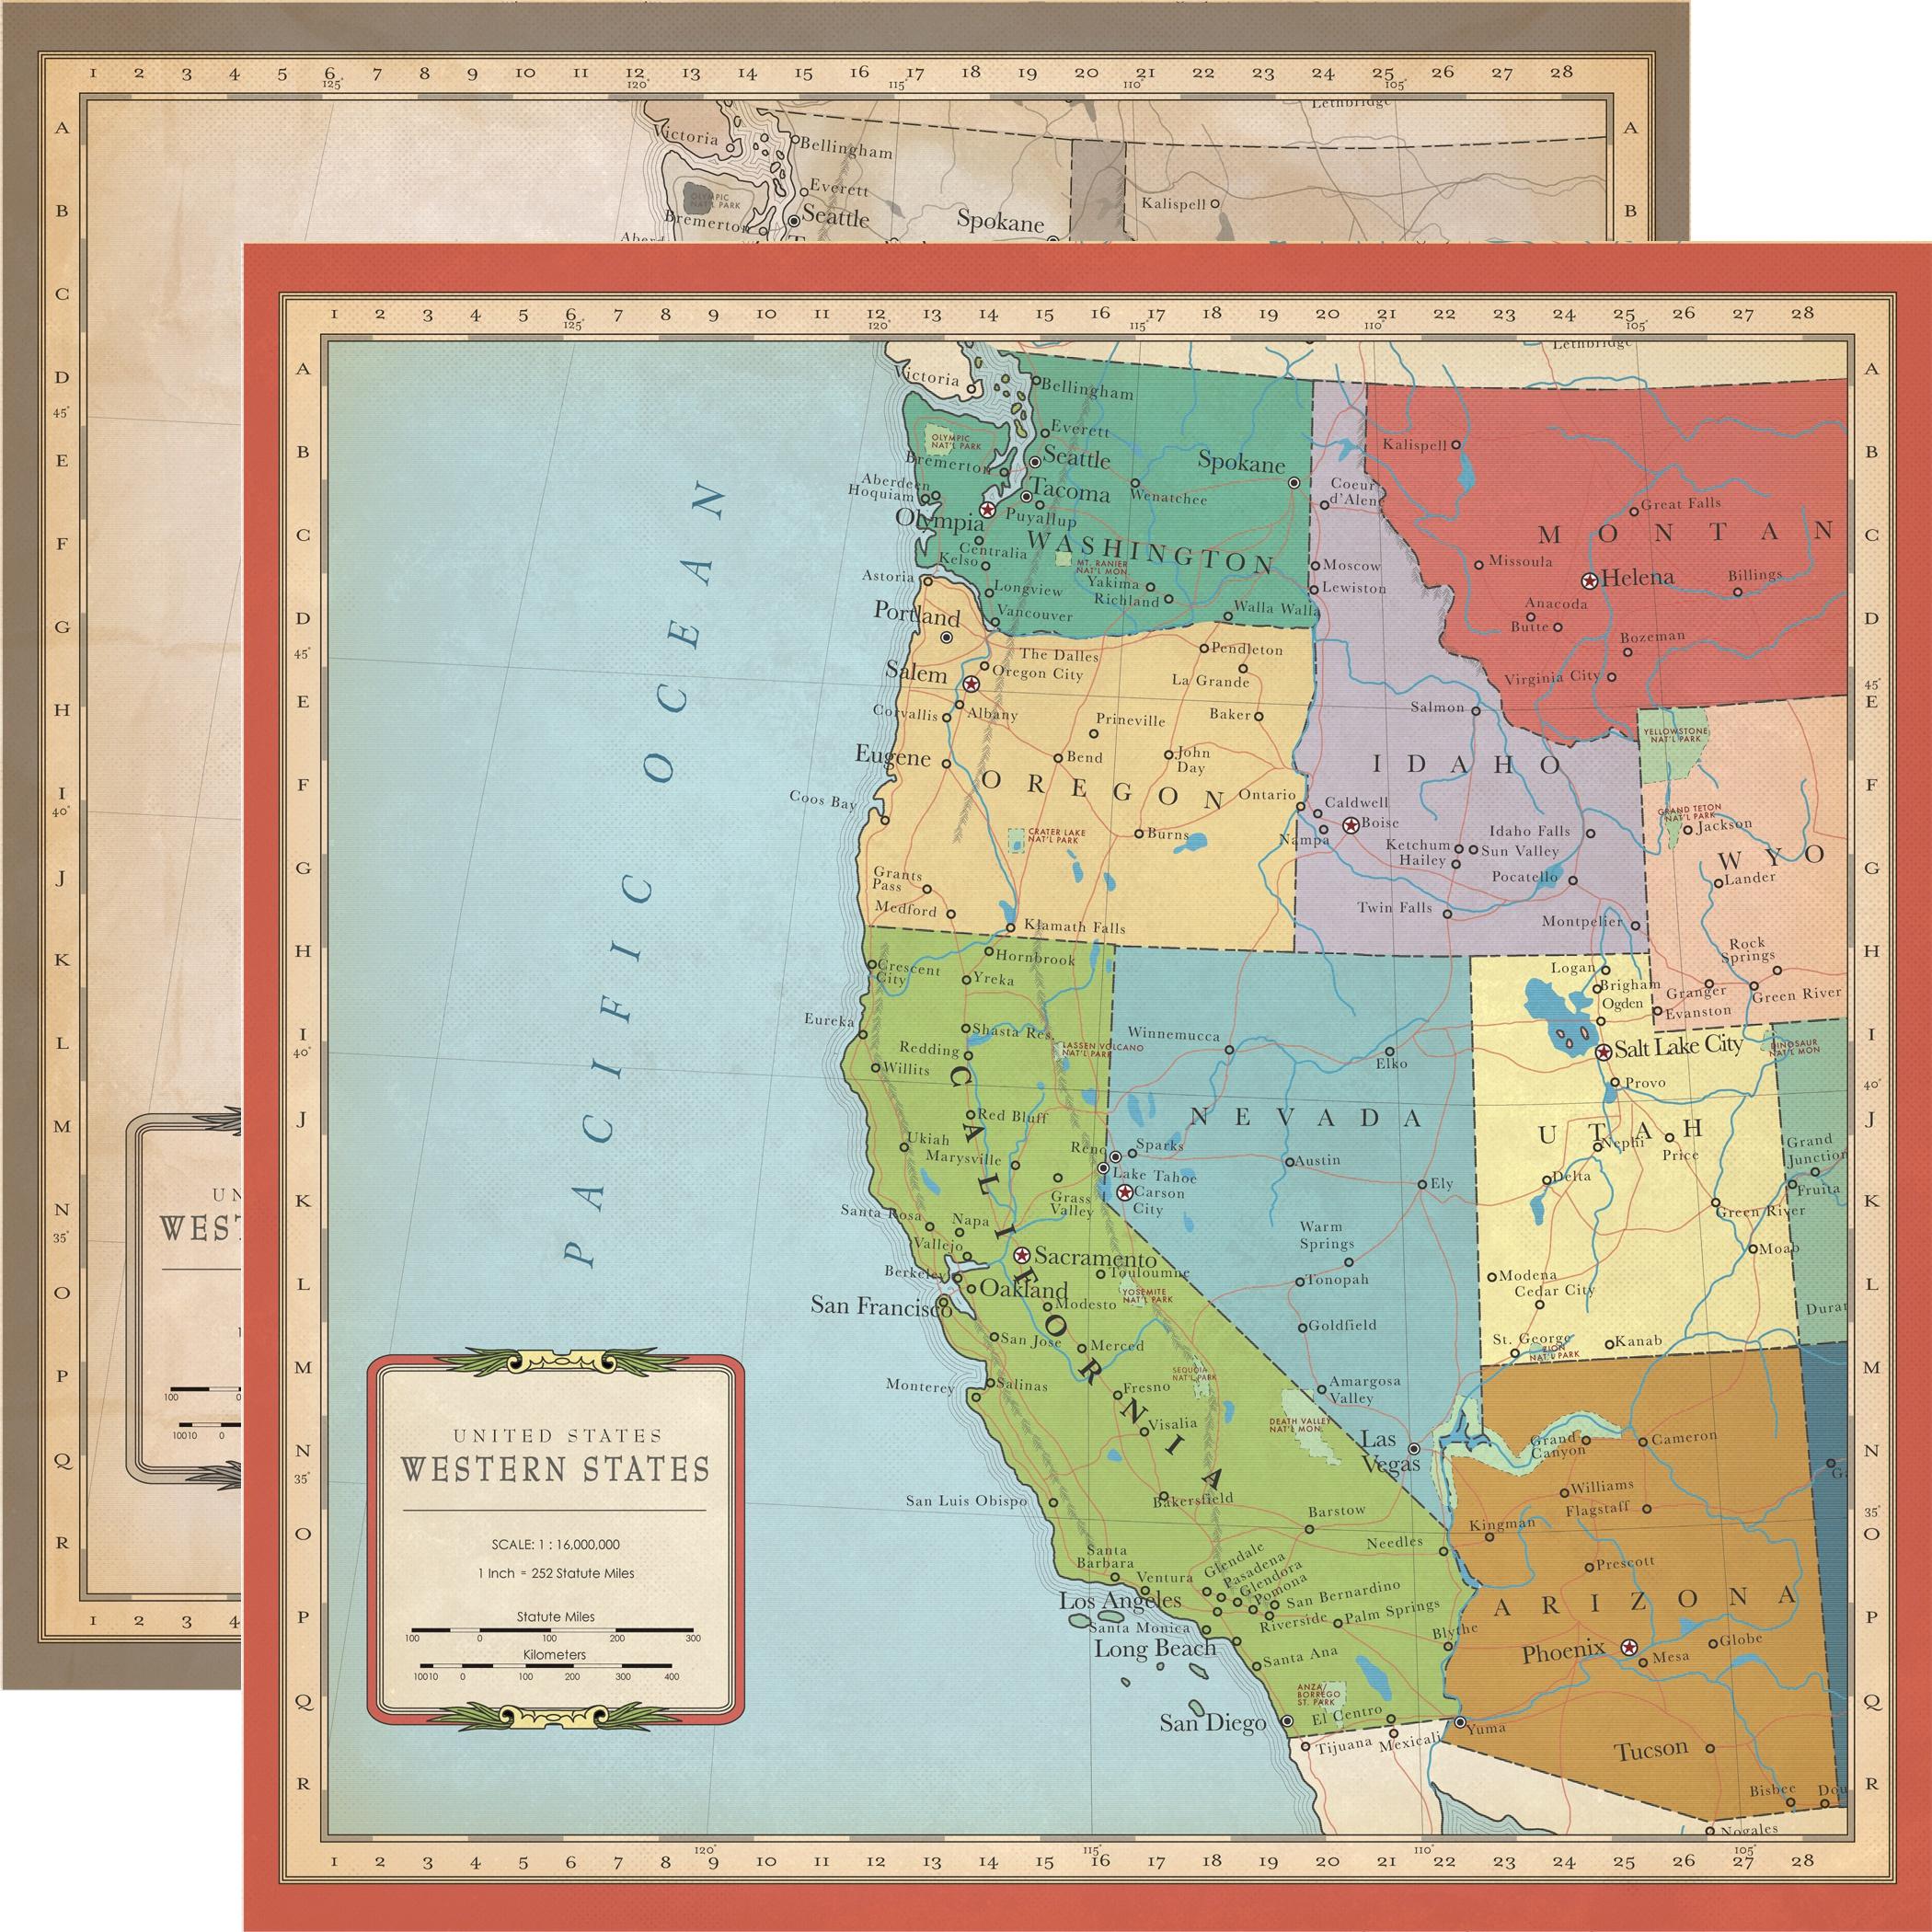 Cartography No.1 - U.S. West Coast Map